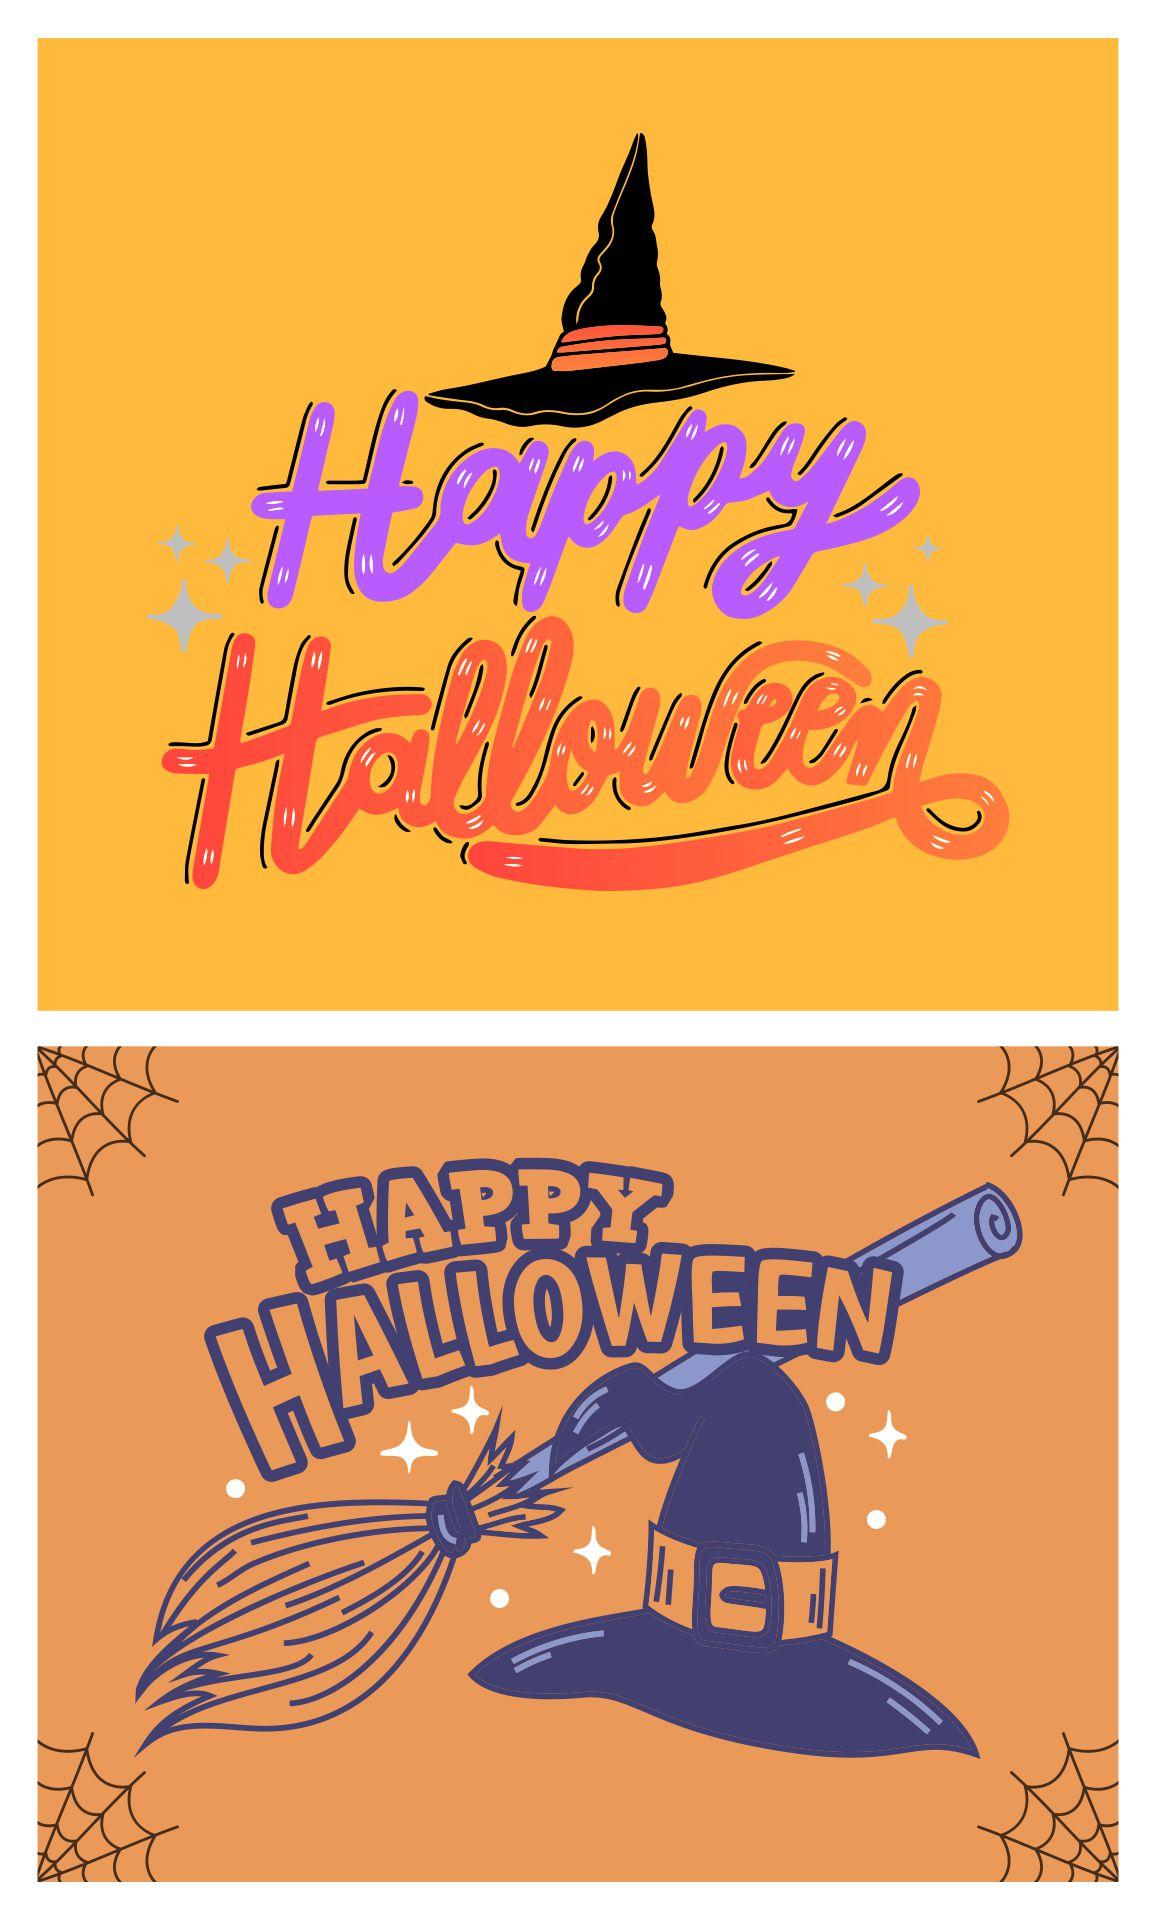 Creative Halloween Greeting Card